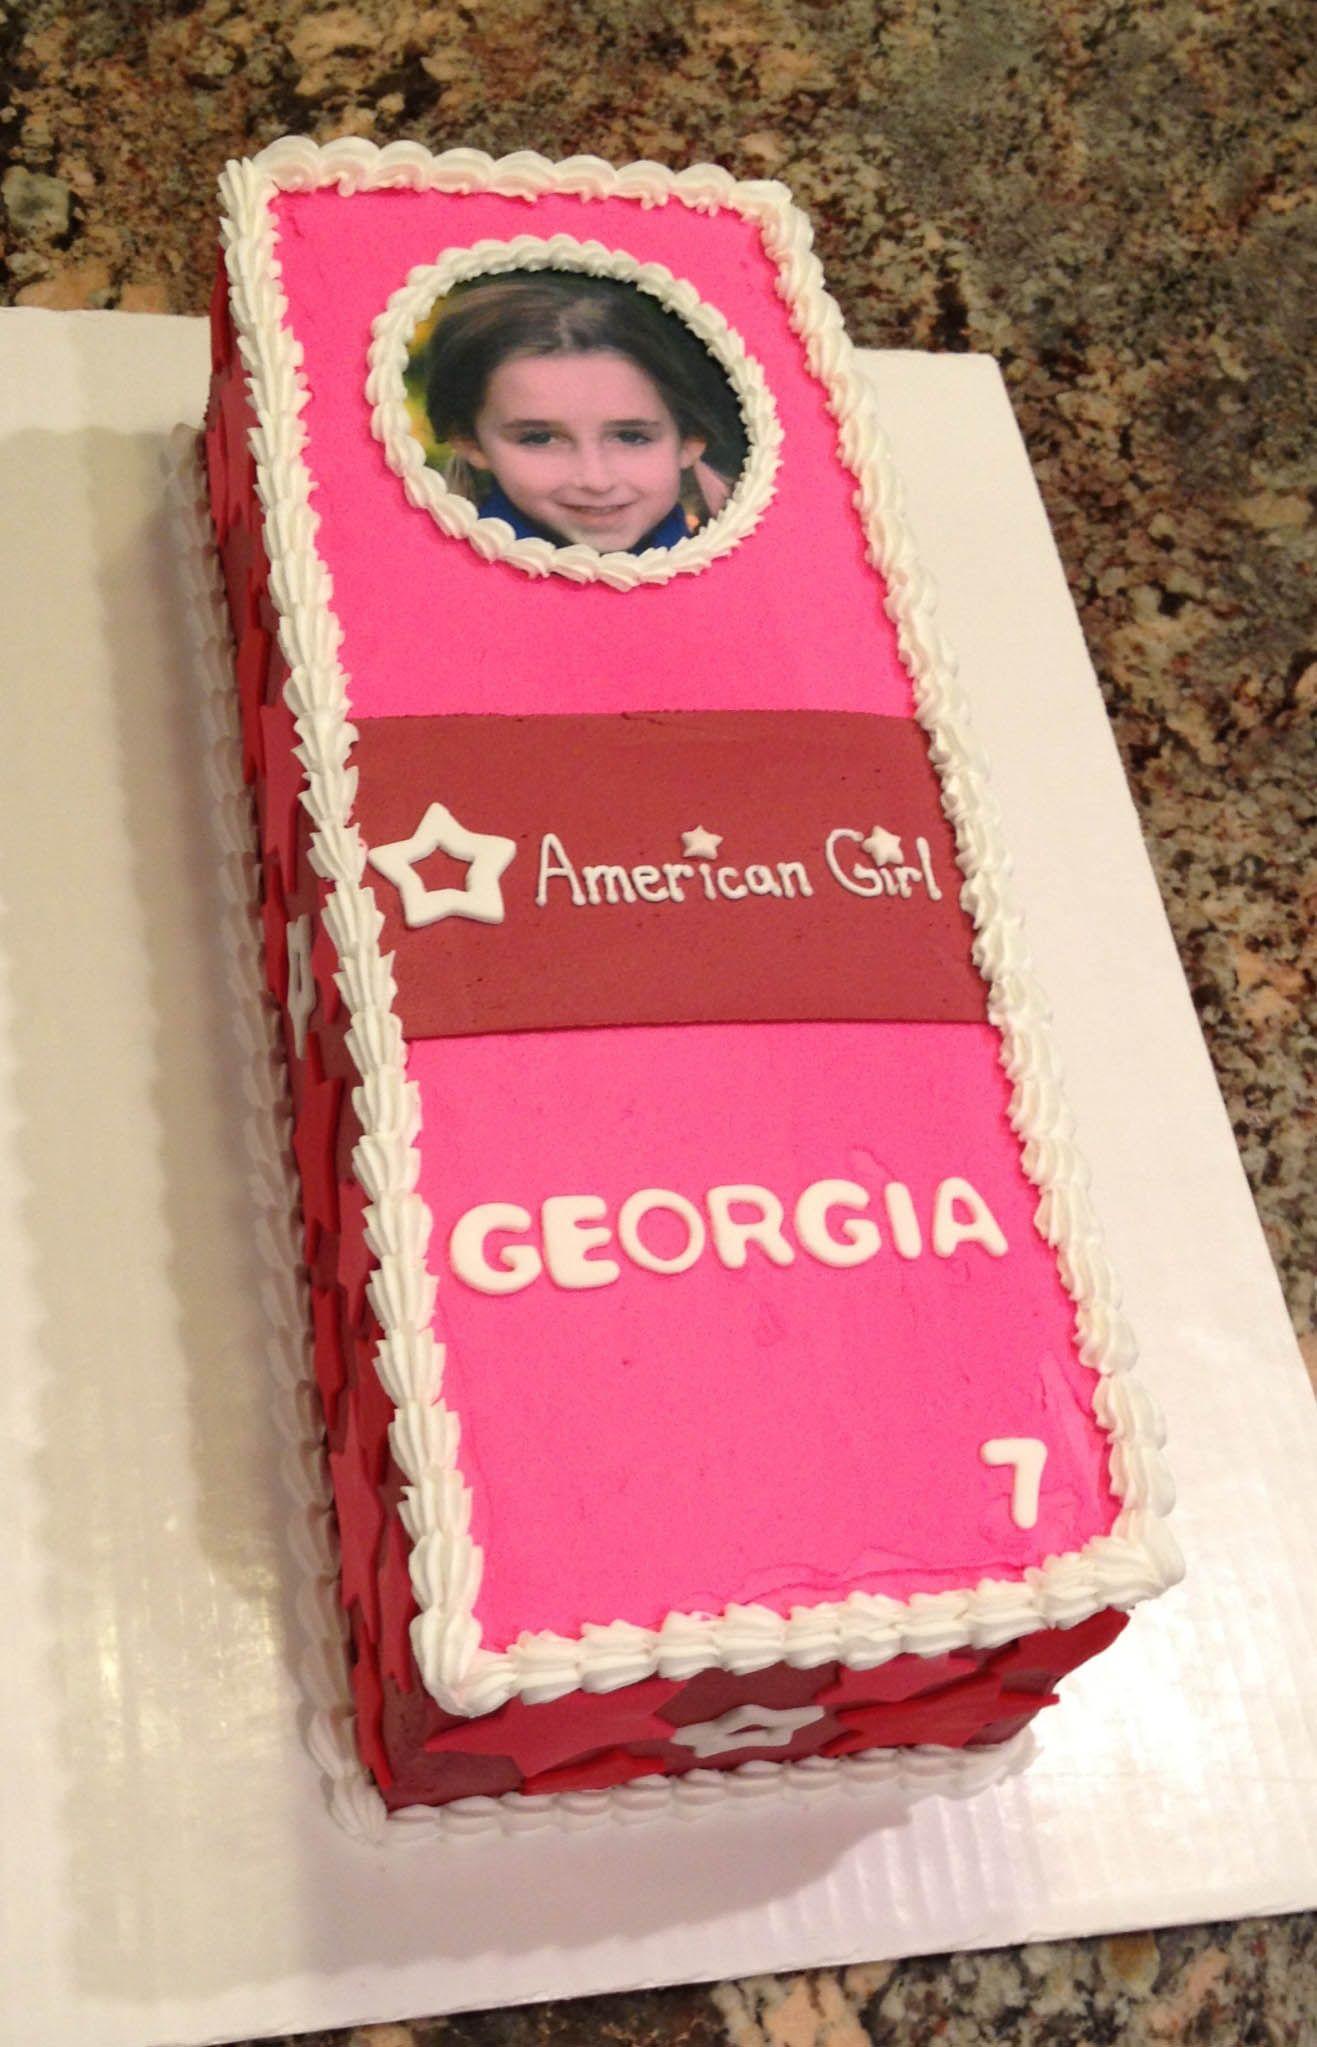 Marvelous American Girl Doll Cake American Girl Birthday American Girl Personalised Birthday Cards Paralily Jamesorg